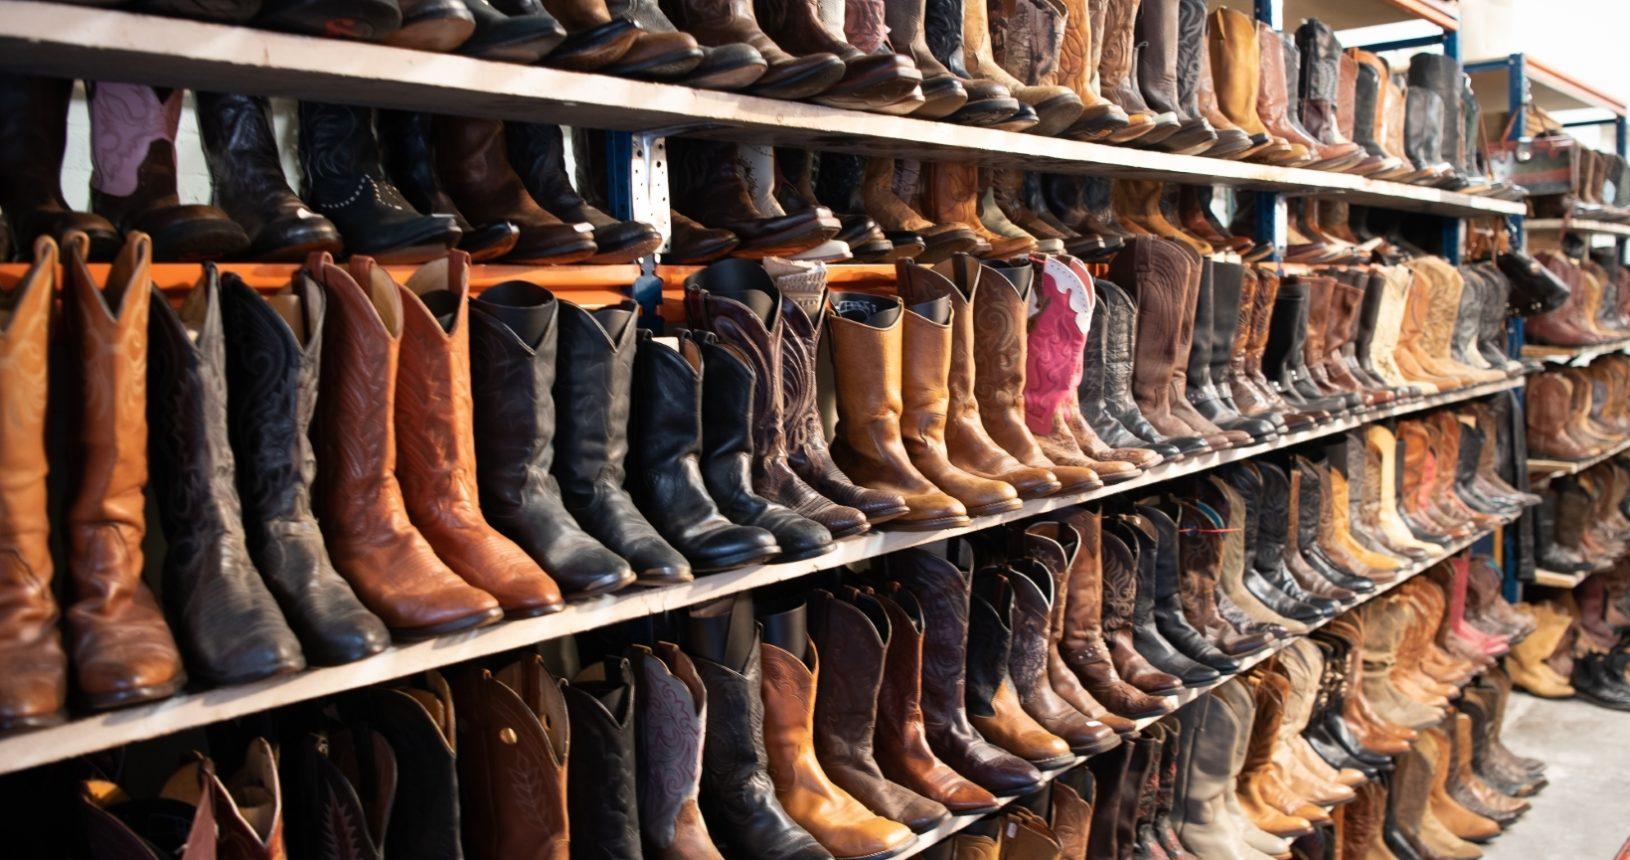 denim-and-boots-nijmegen-182